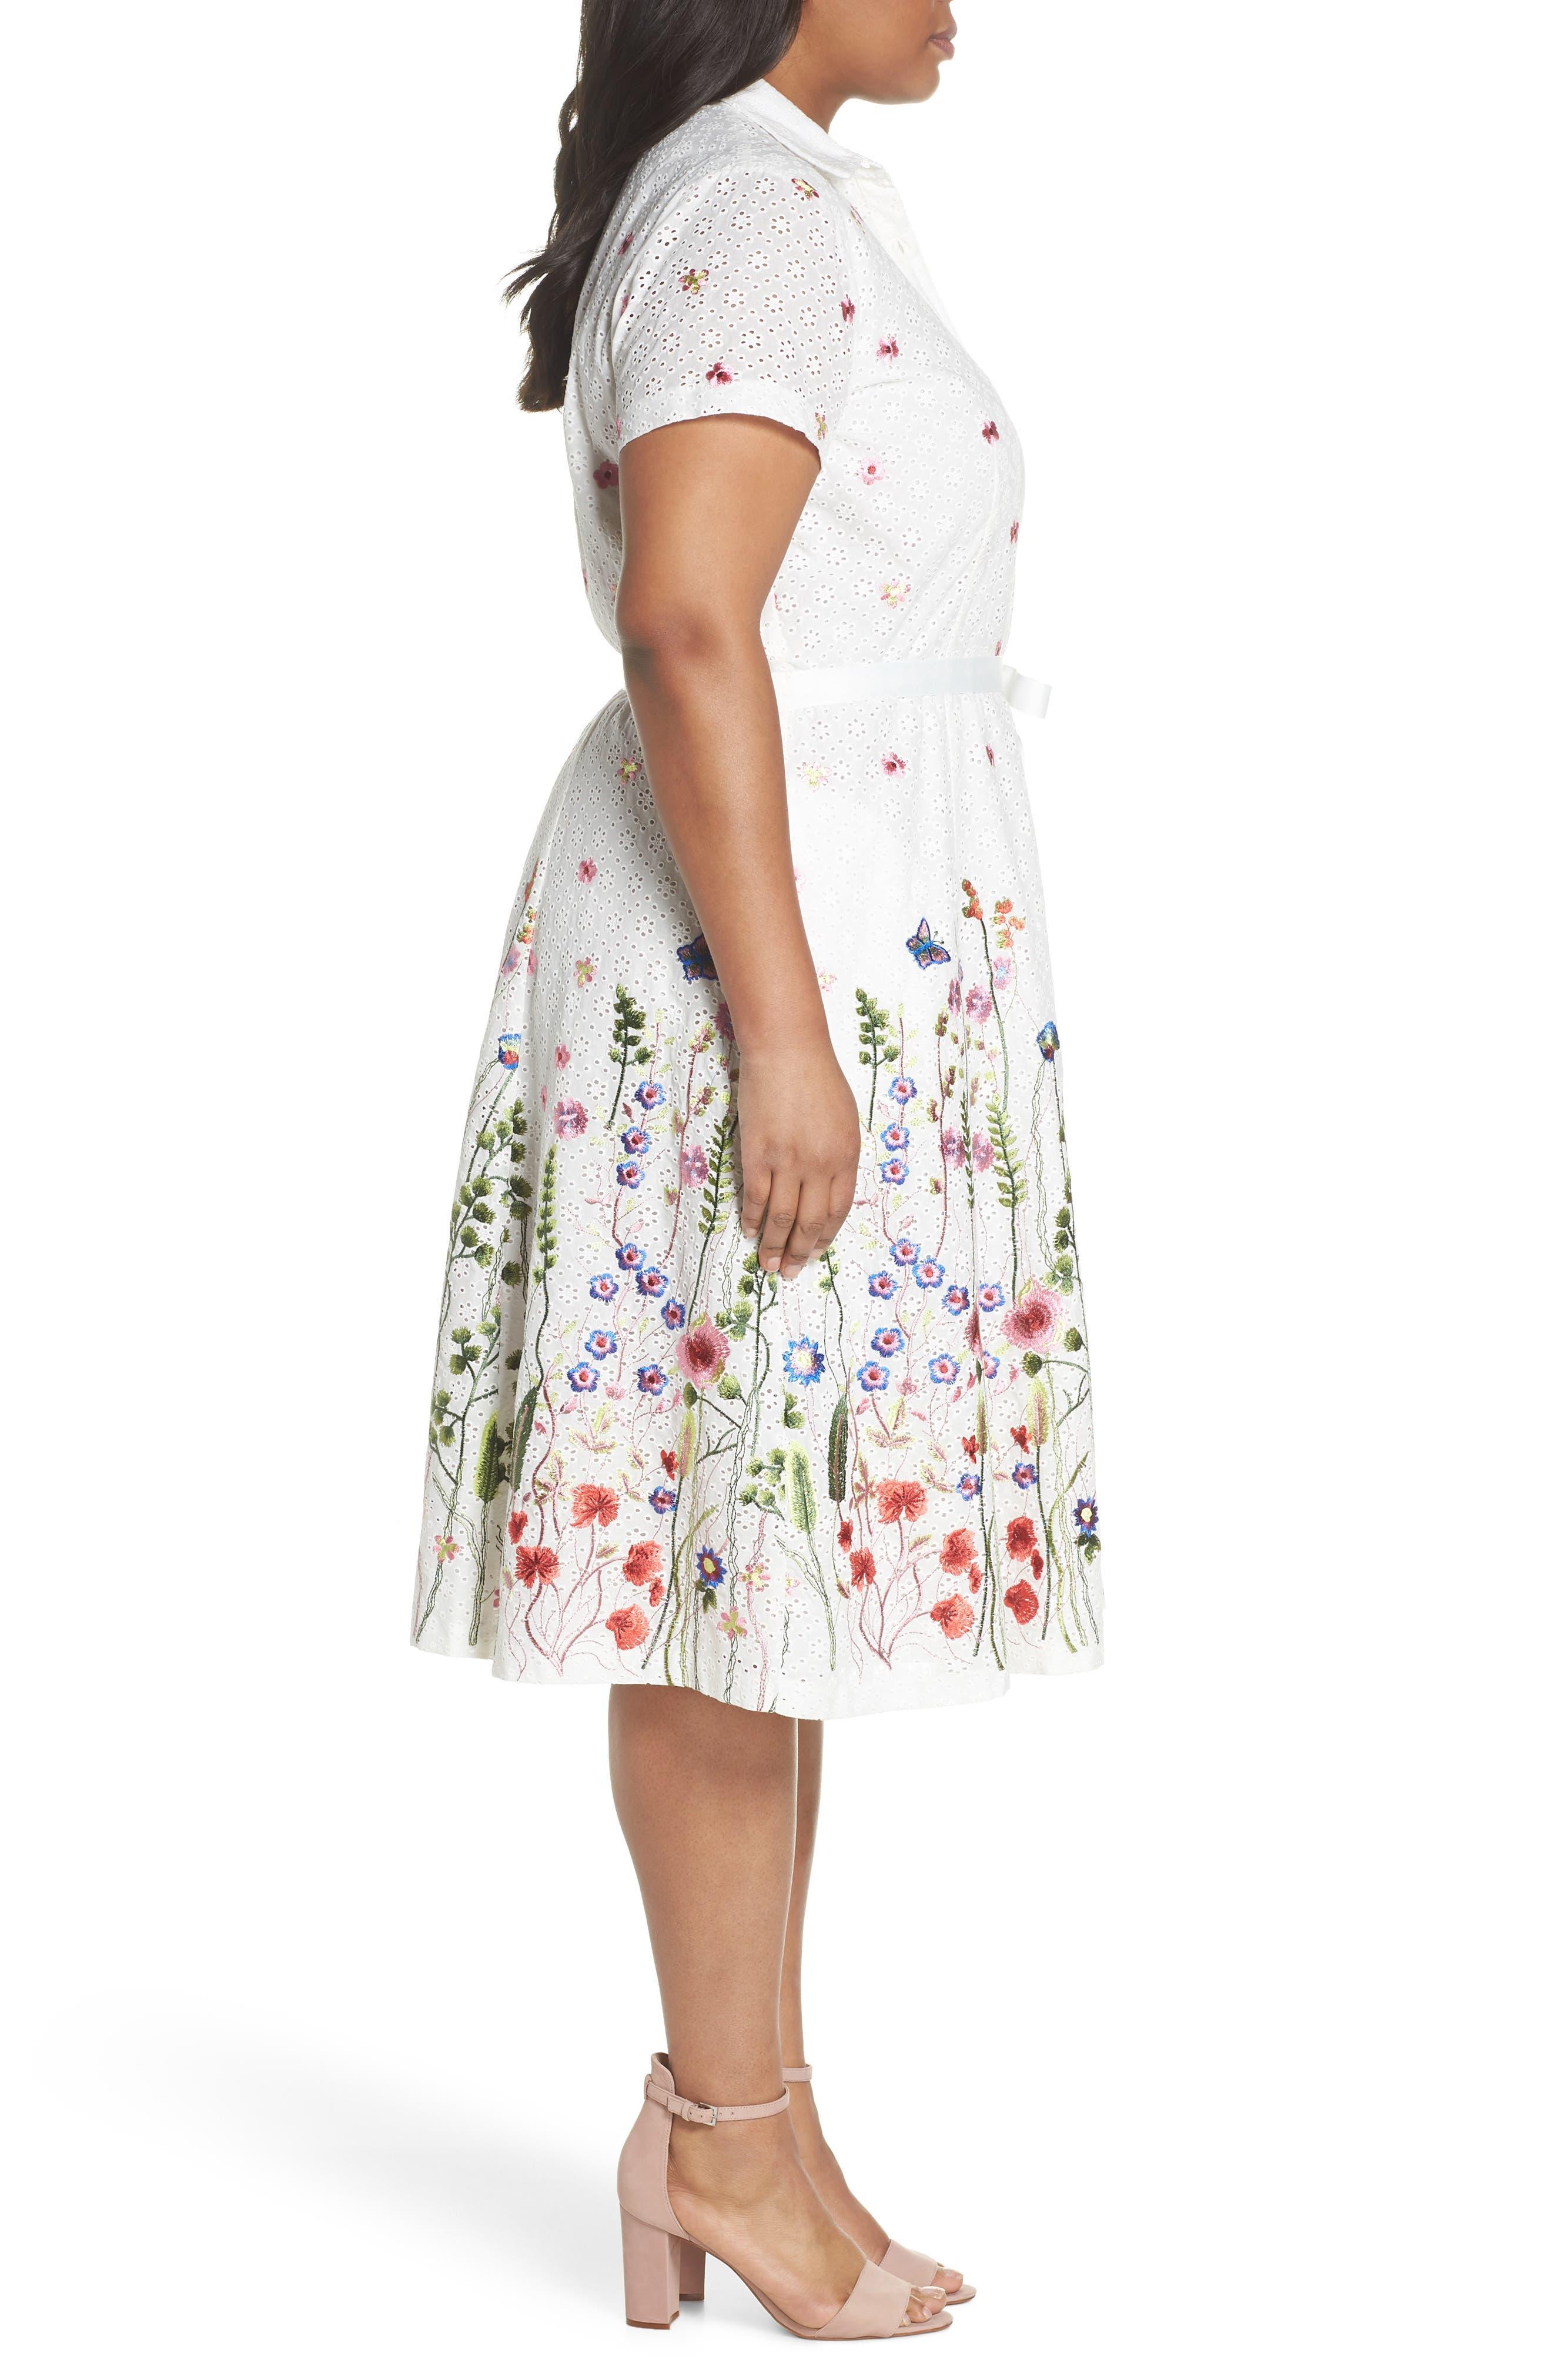 Floral Embroidered Eyelet Shirtdress,                             Alternate thumbnail 3, color,                             White/ Royal/ Green